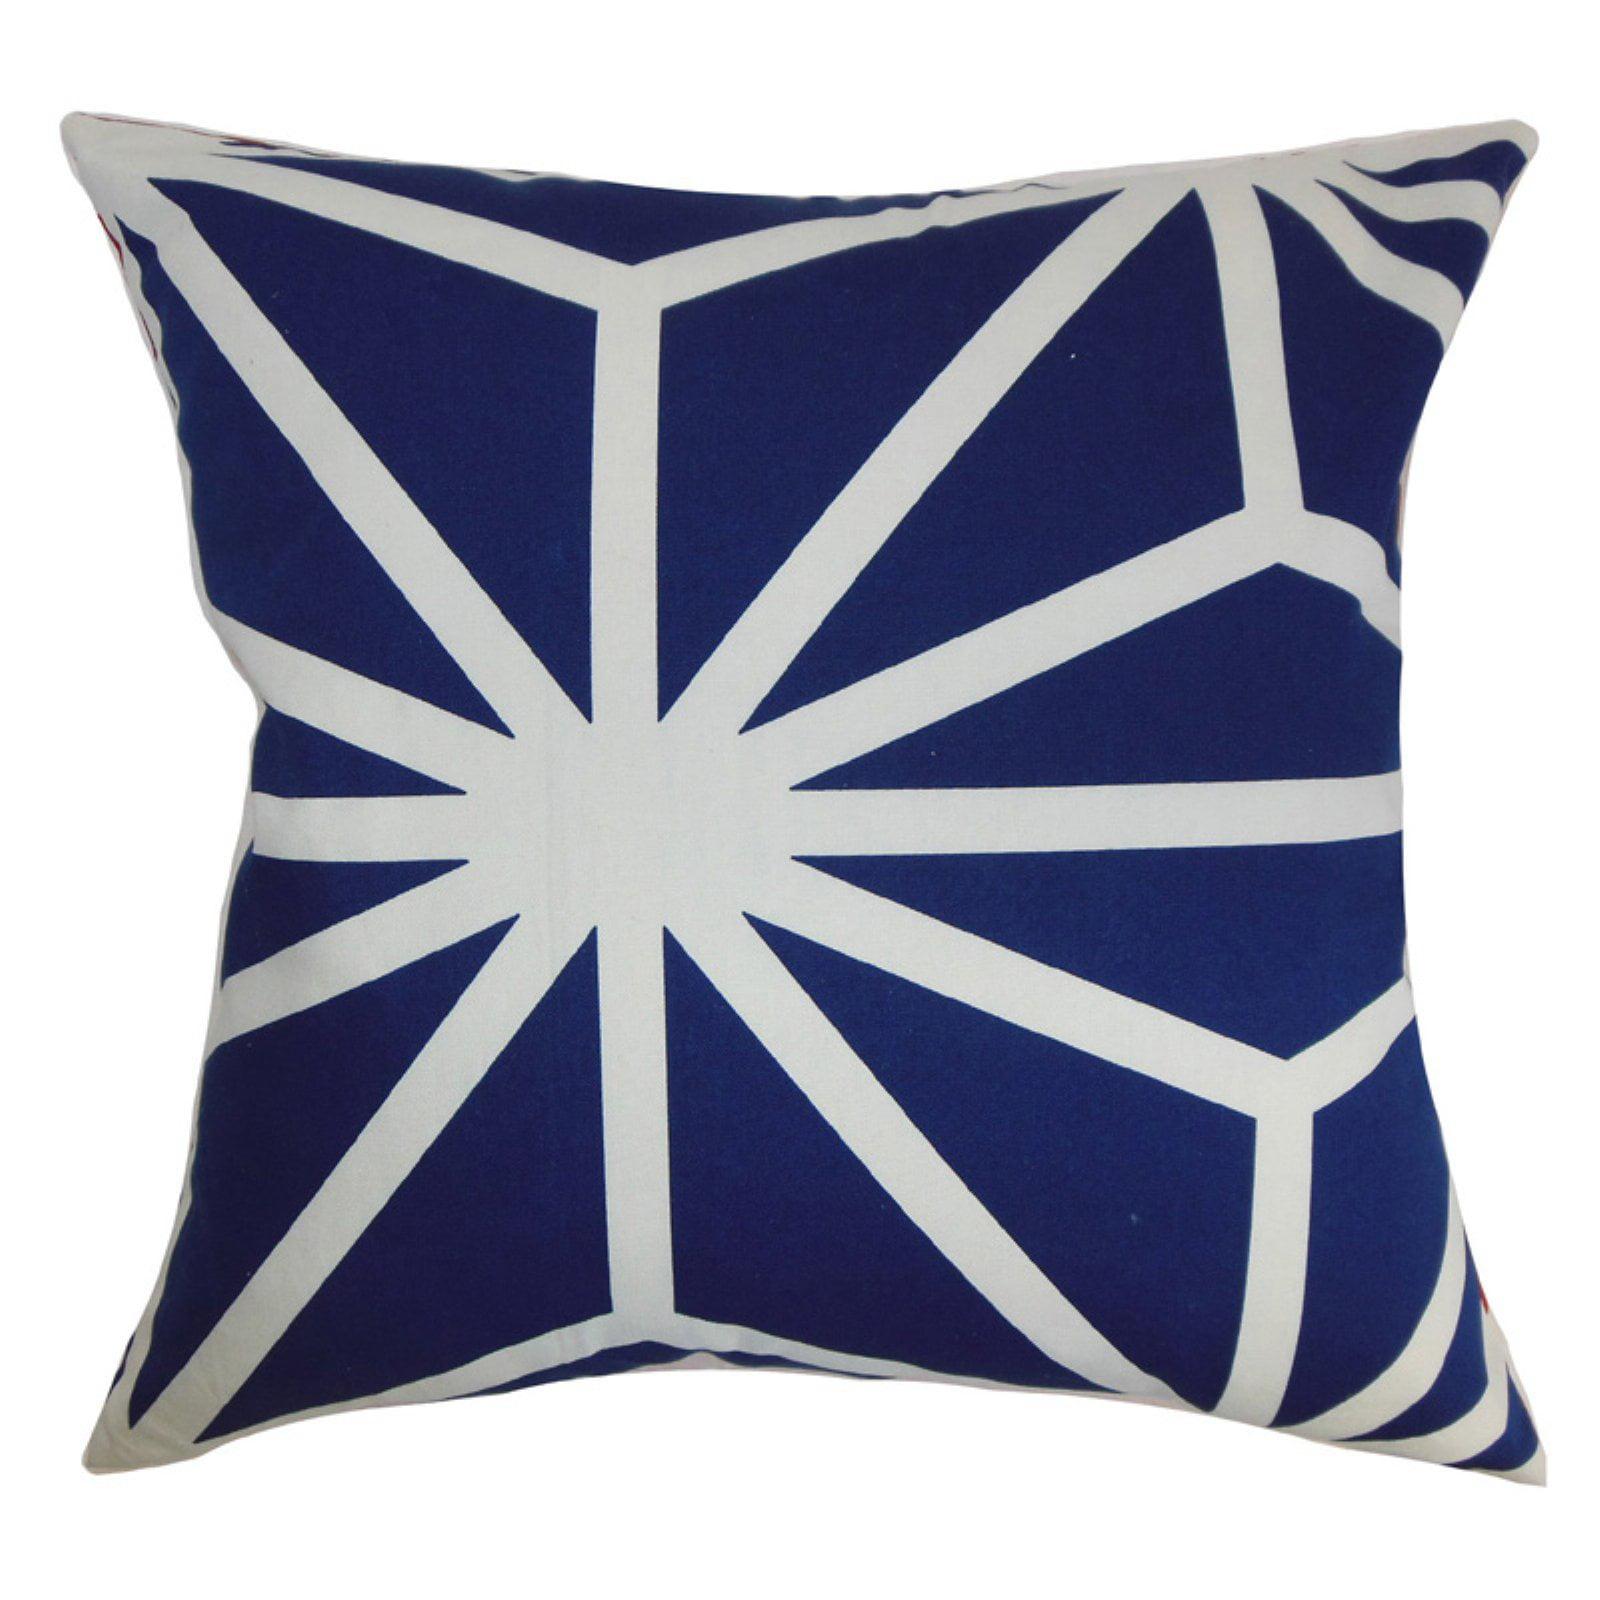 The Pillow Collection Dazu Geometric Pillow